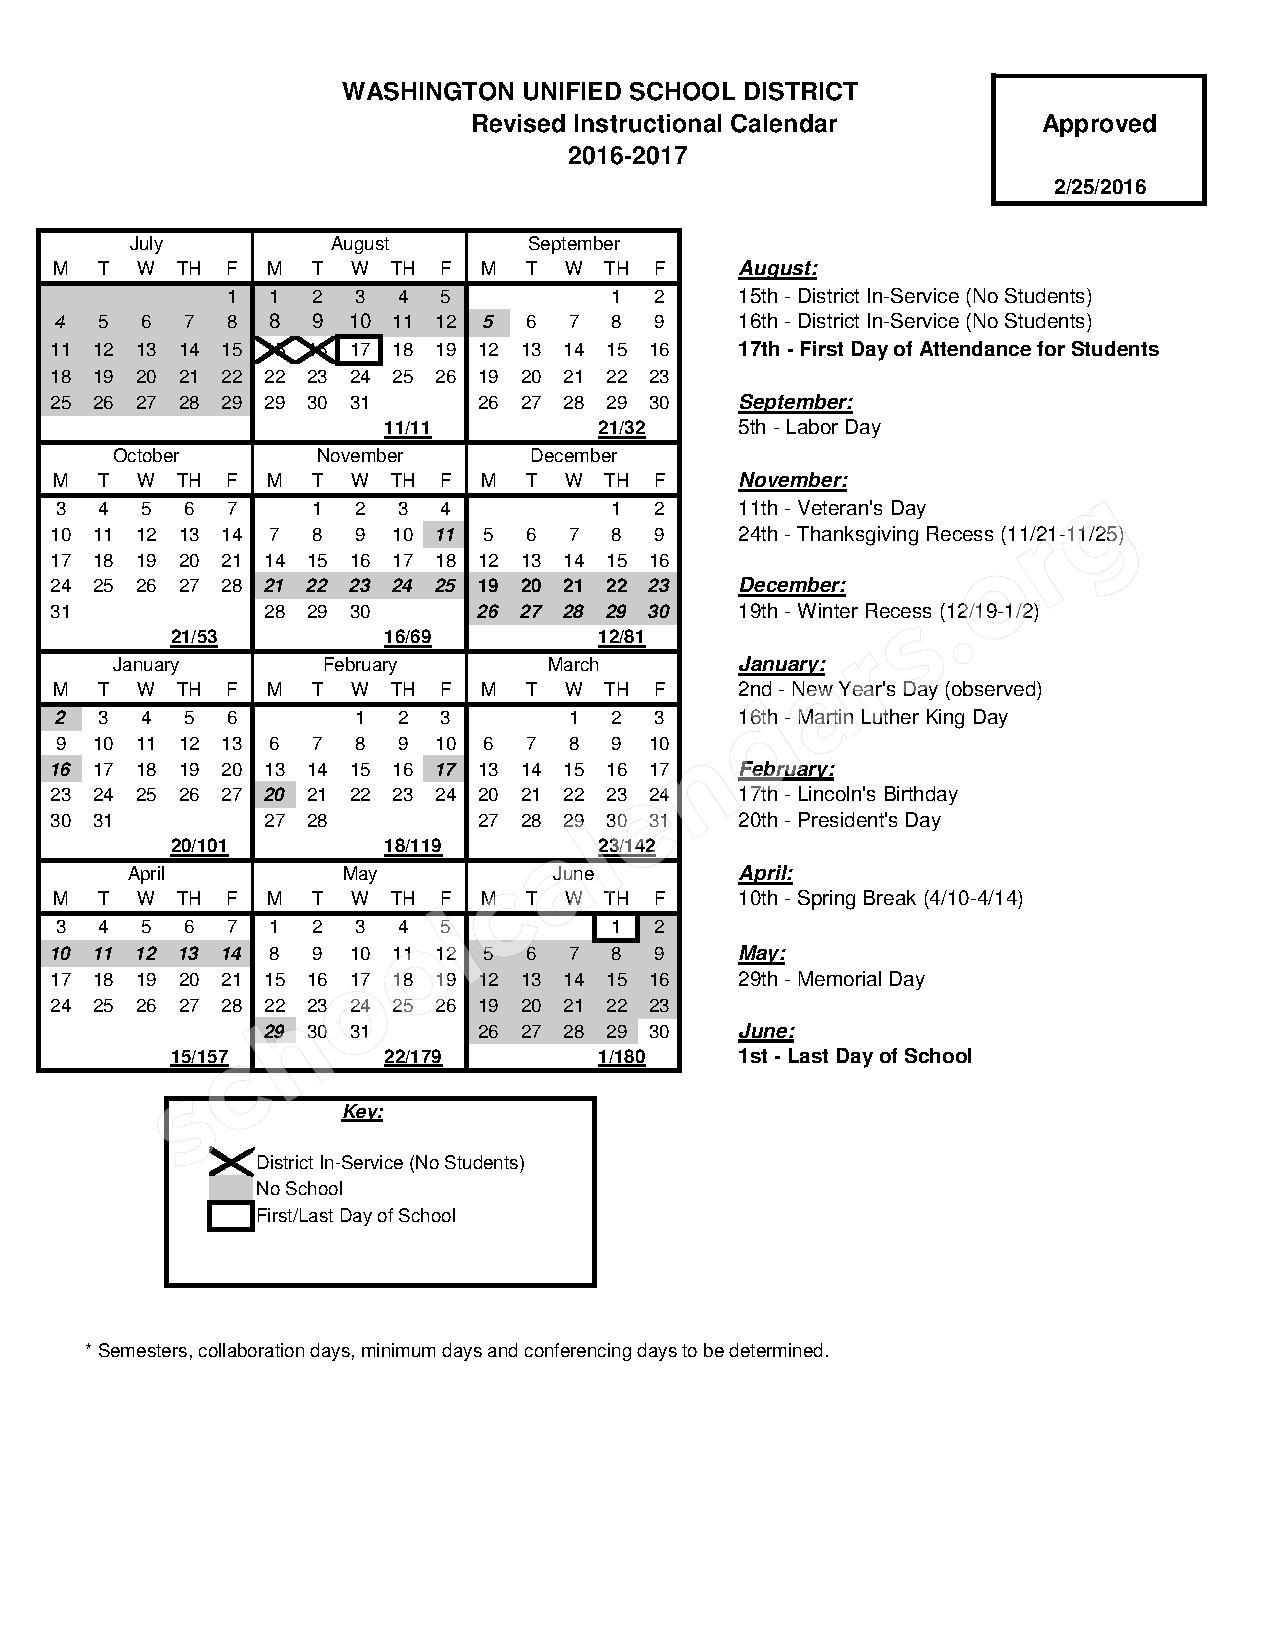 2016 - 2017 School Calendar – Washington Unified School District – page 1